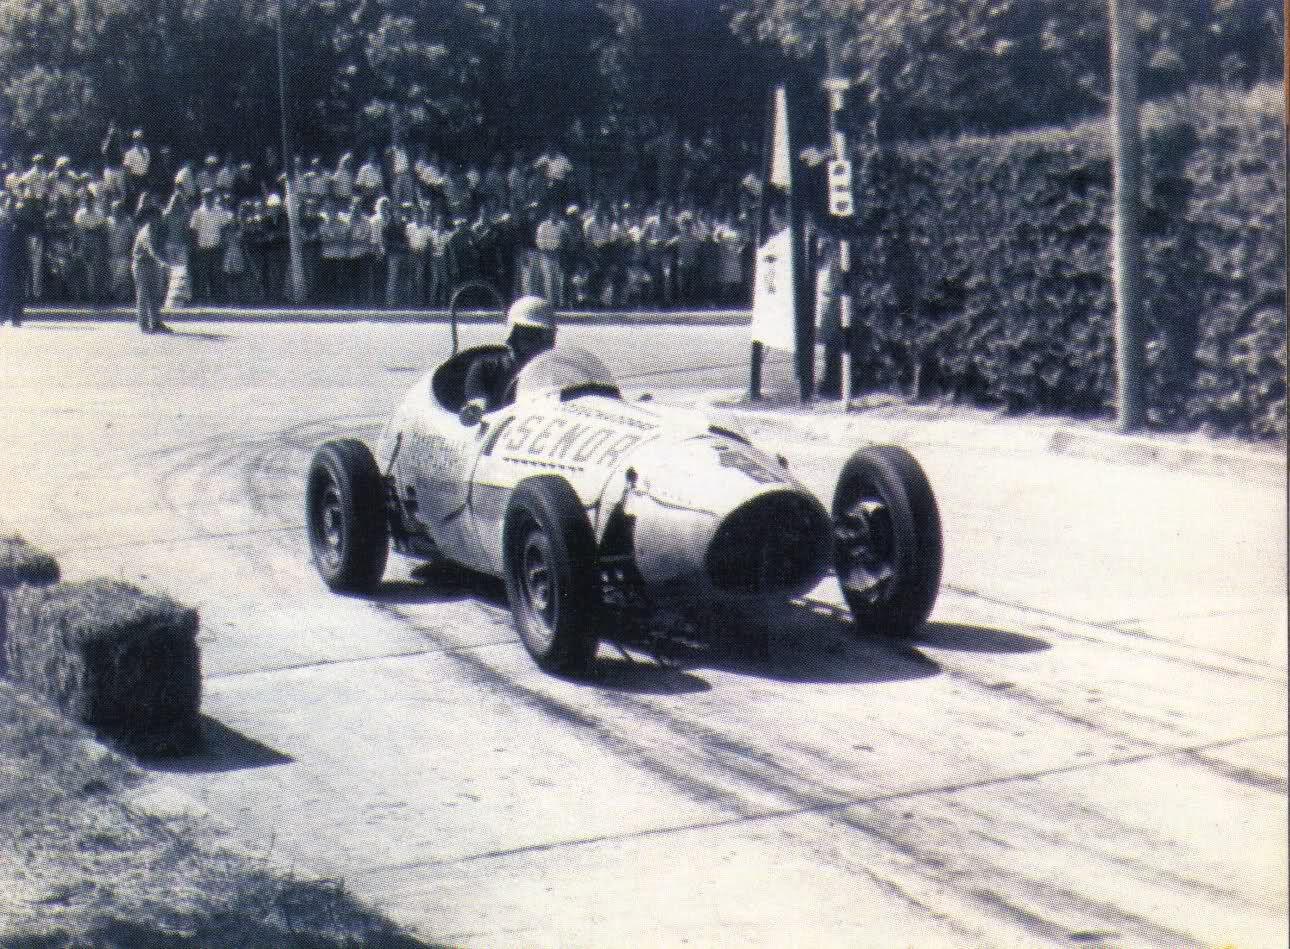 1953 argentine gp oscar galvez maserati a6gcm 5th f1 1950 s pinterest maserati and cars